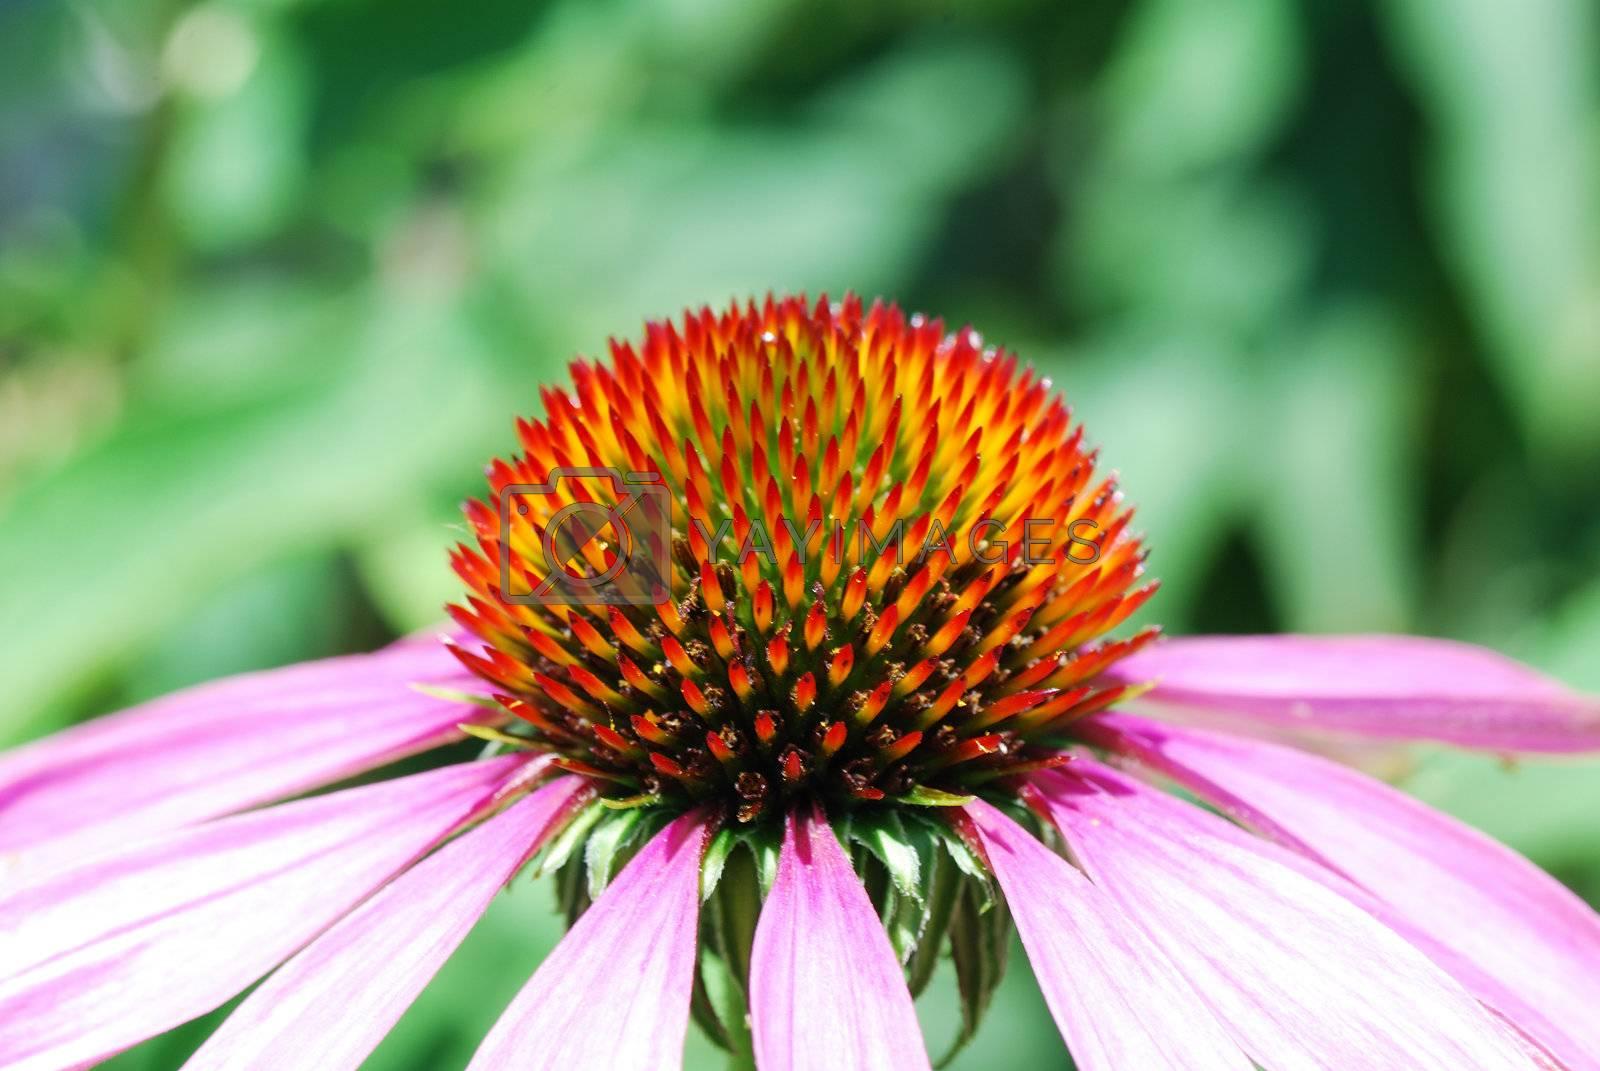 fresh spiny flower bloom from the garden in summer